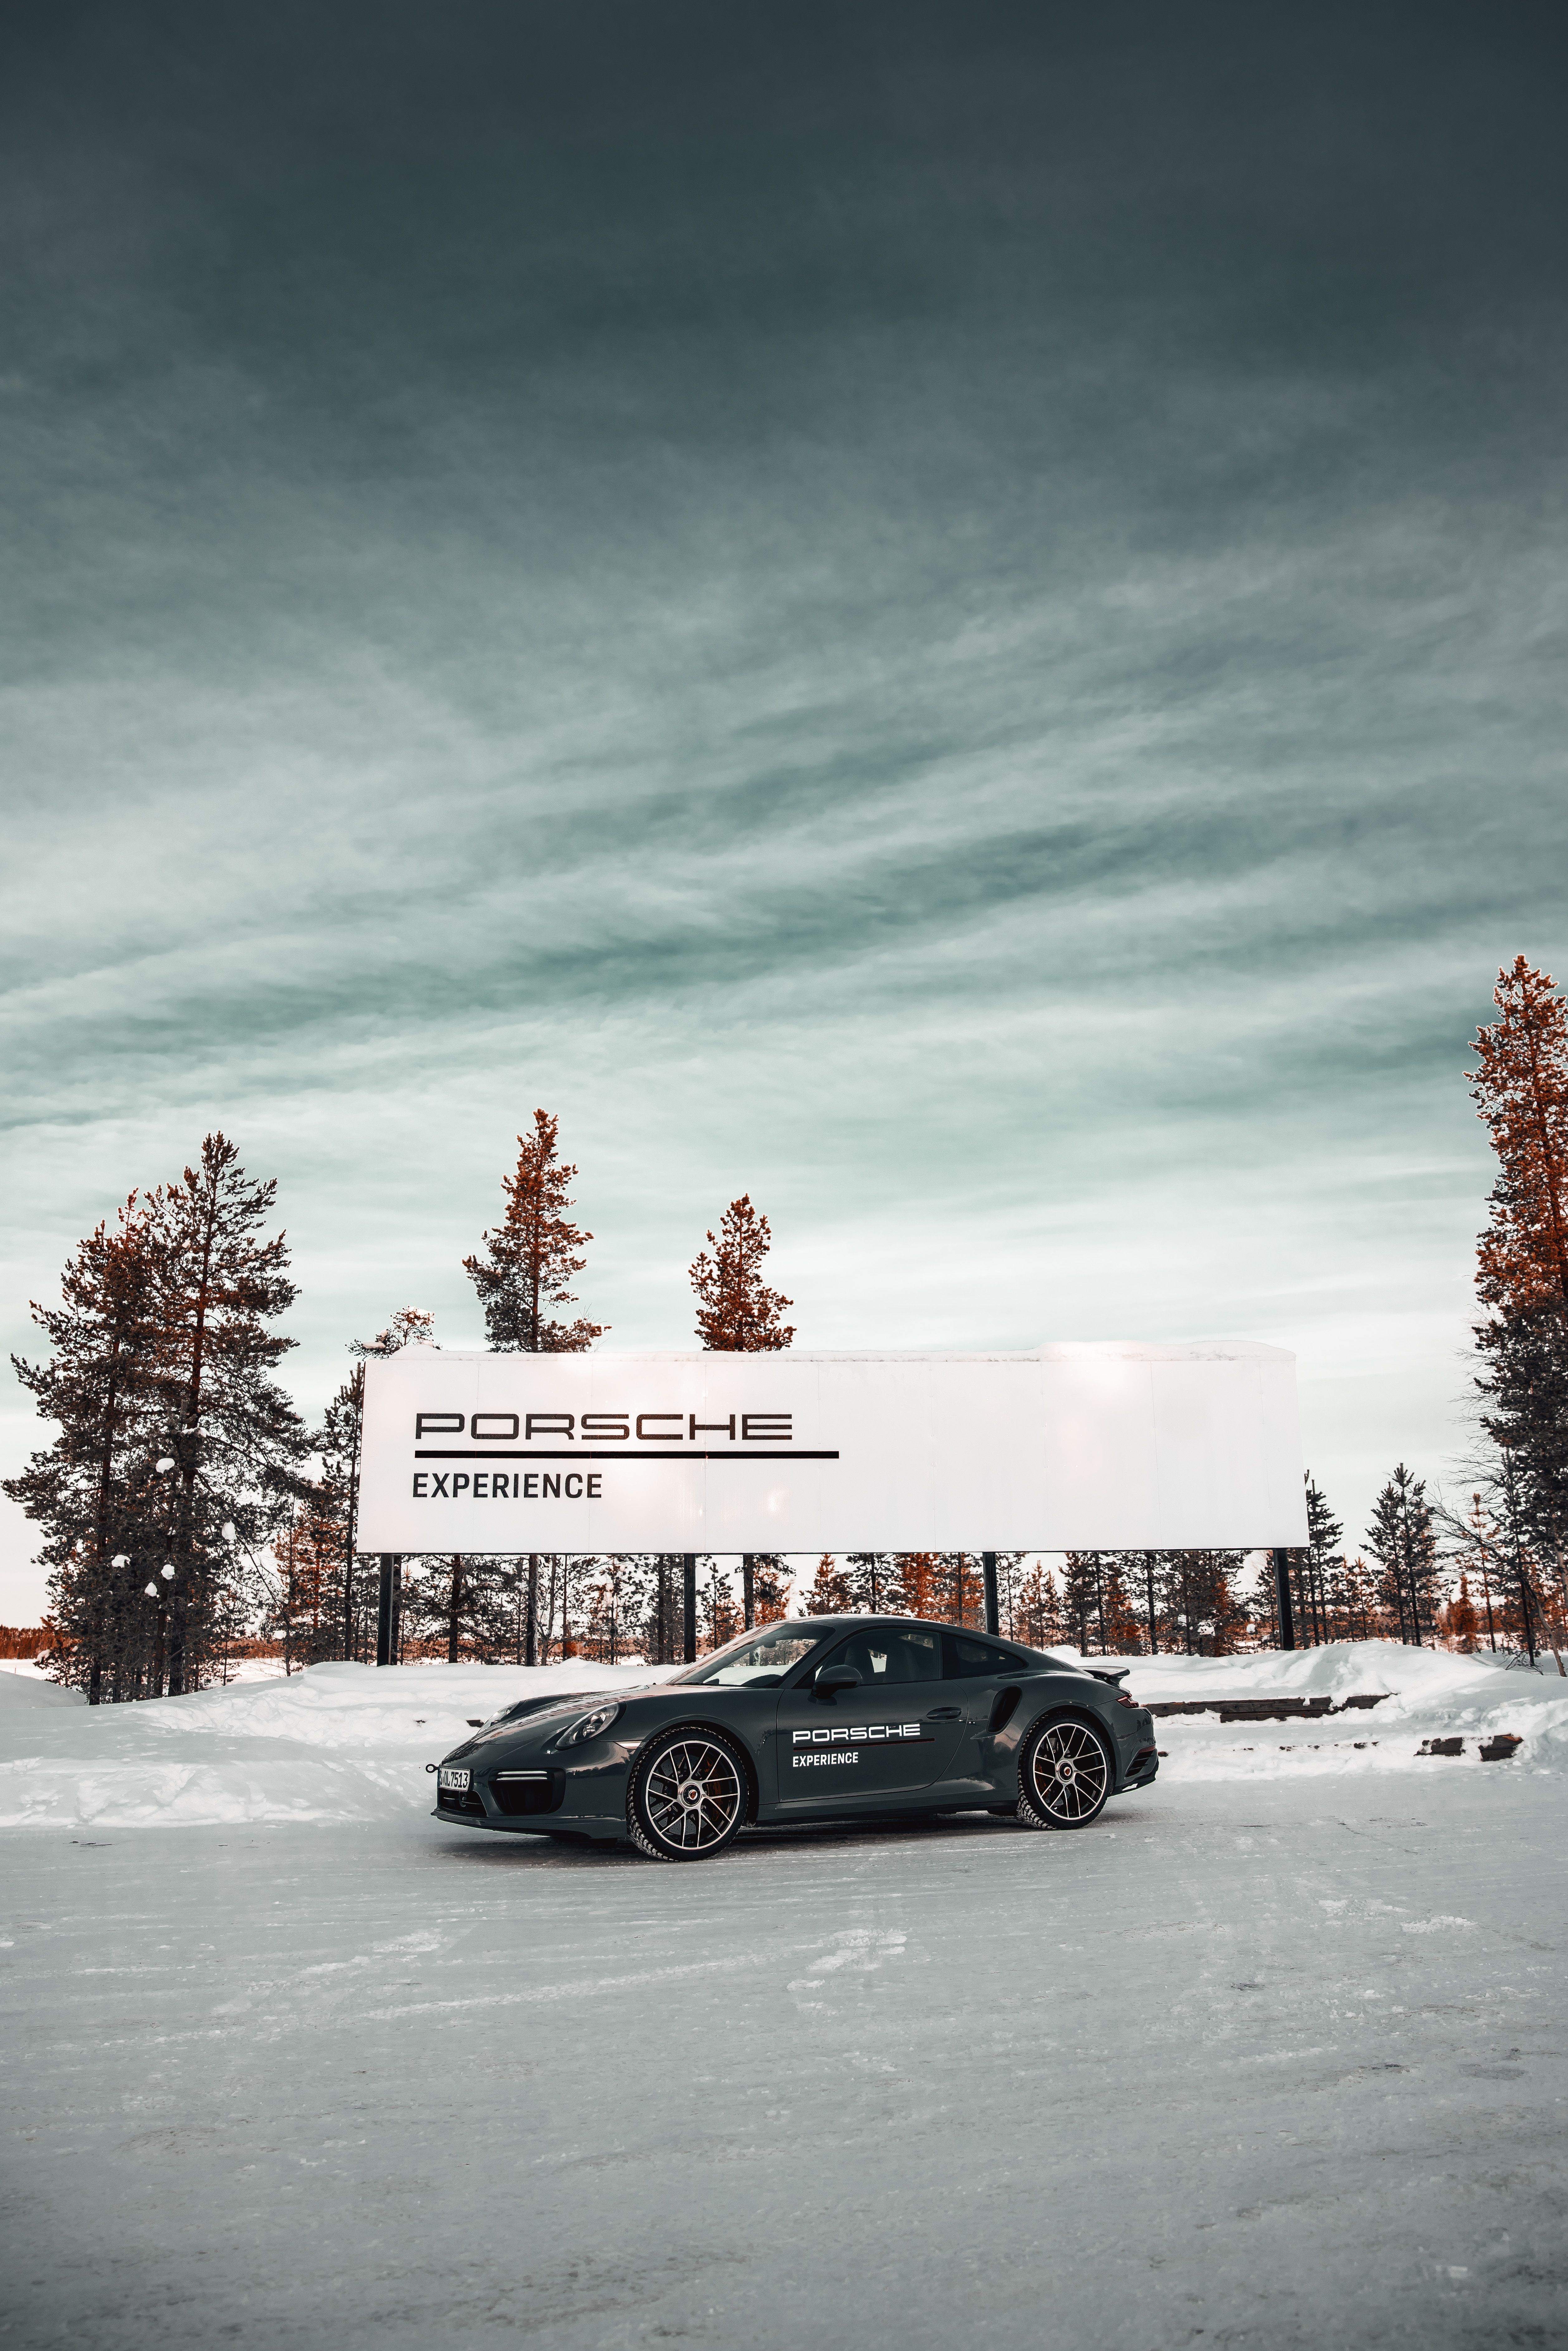 Pin By Bibek Adhikari On Car Wallpapers Car Wallpapers Black Porsche Porsche Experience